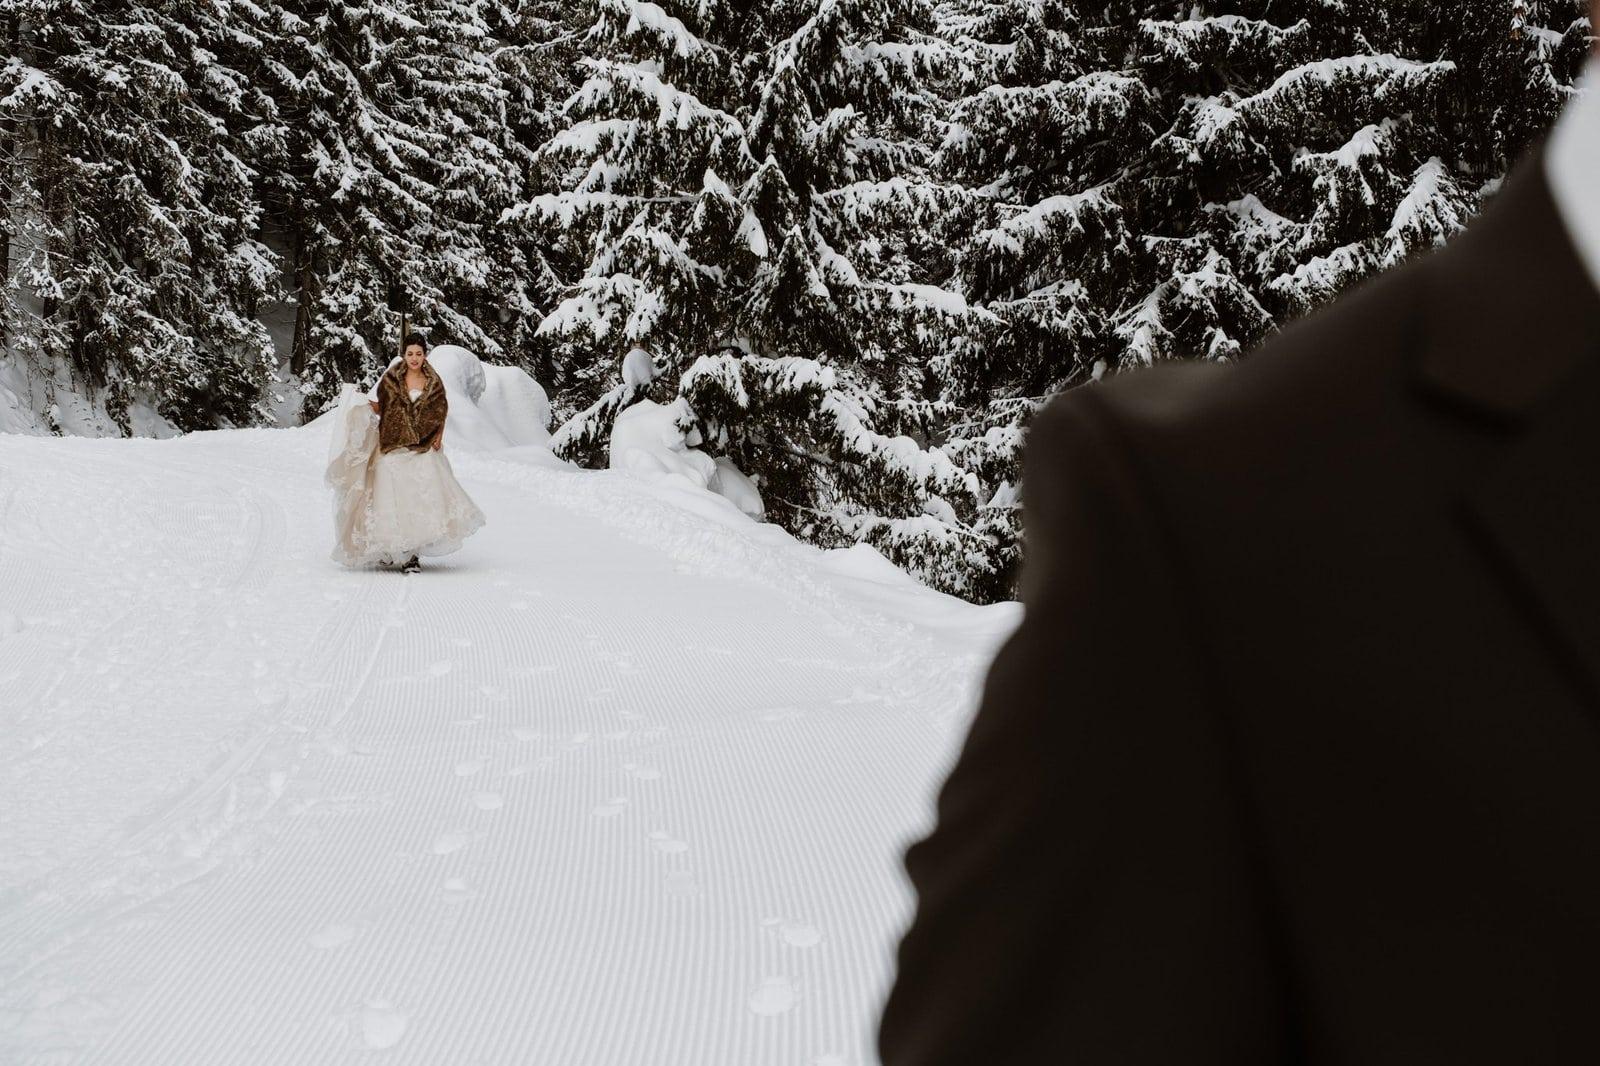 wedding adventure first look